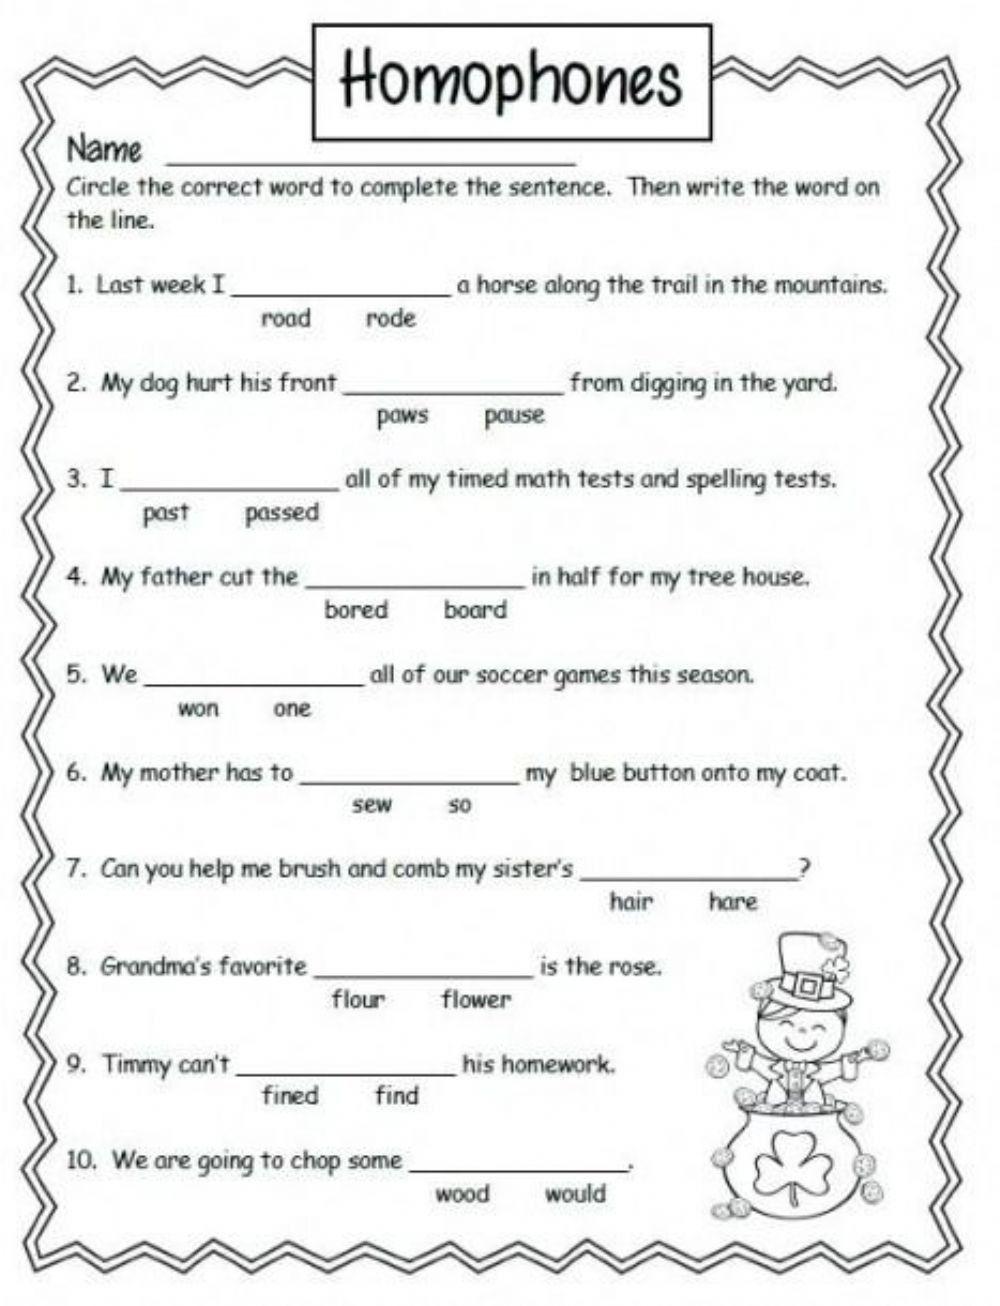 Homophones Worksheet 4th Grade Homophones Worksheet 2nd Grade Worksheets Homophones Worksheets 2nd Grade Grammar